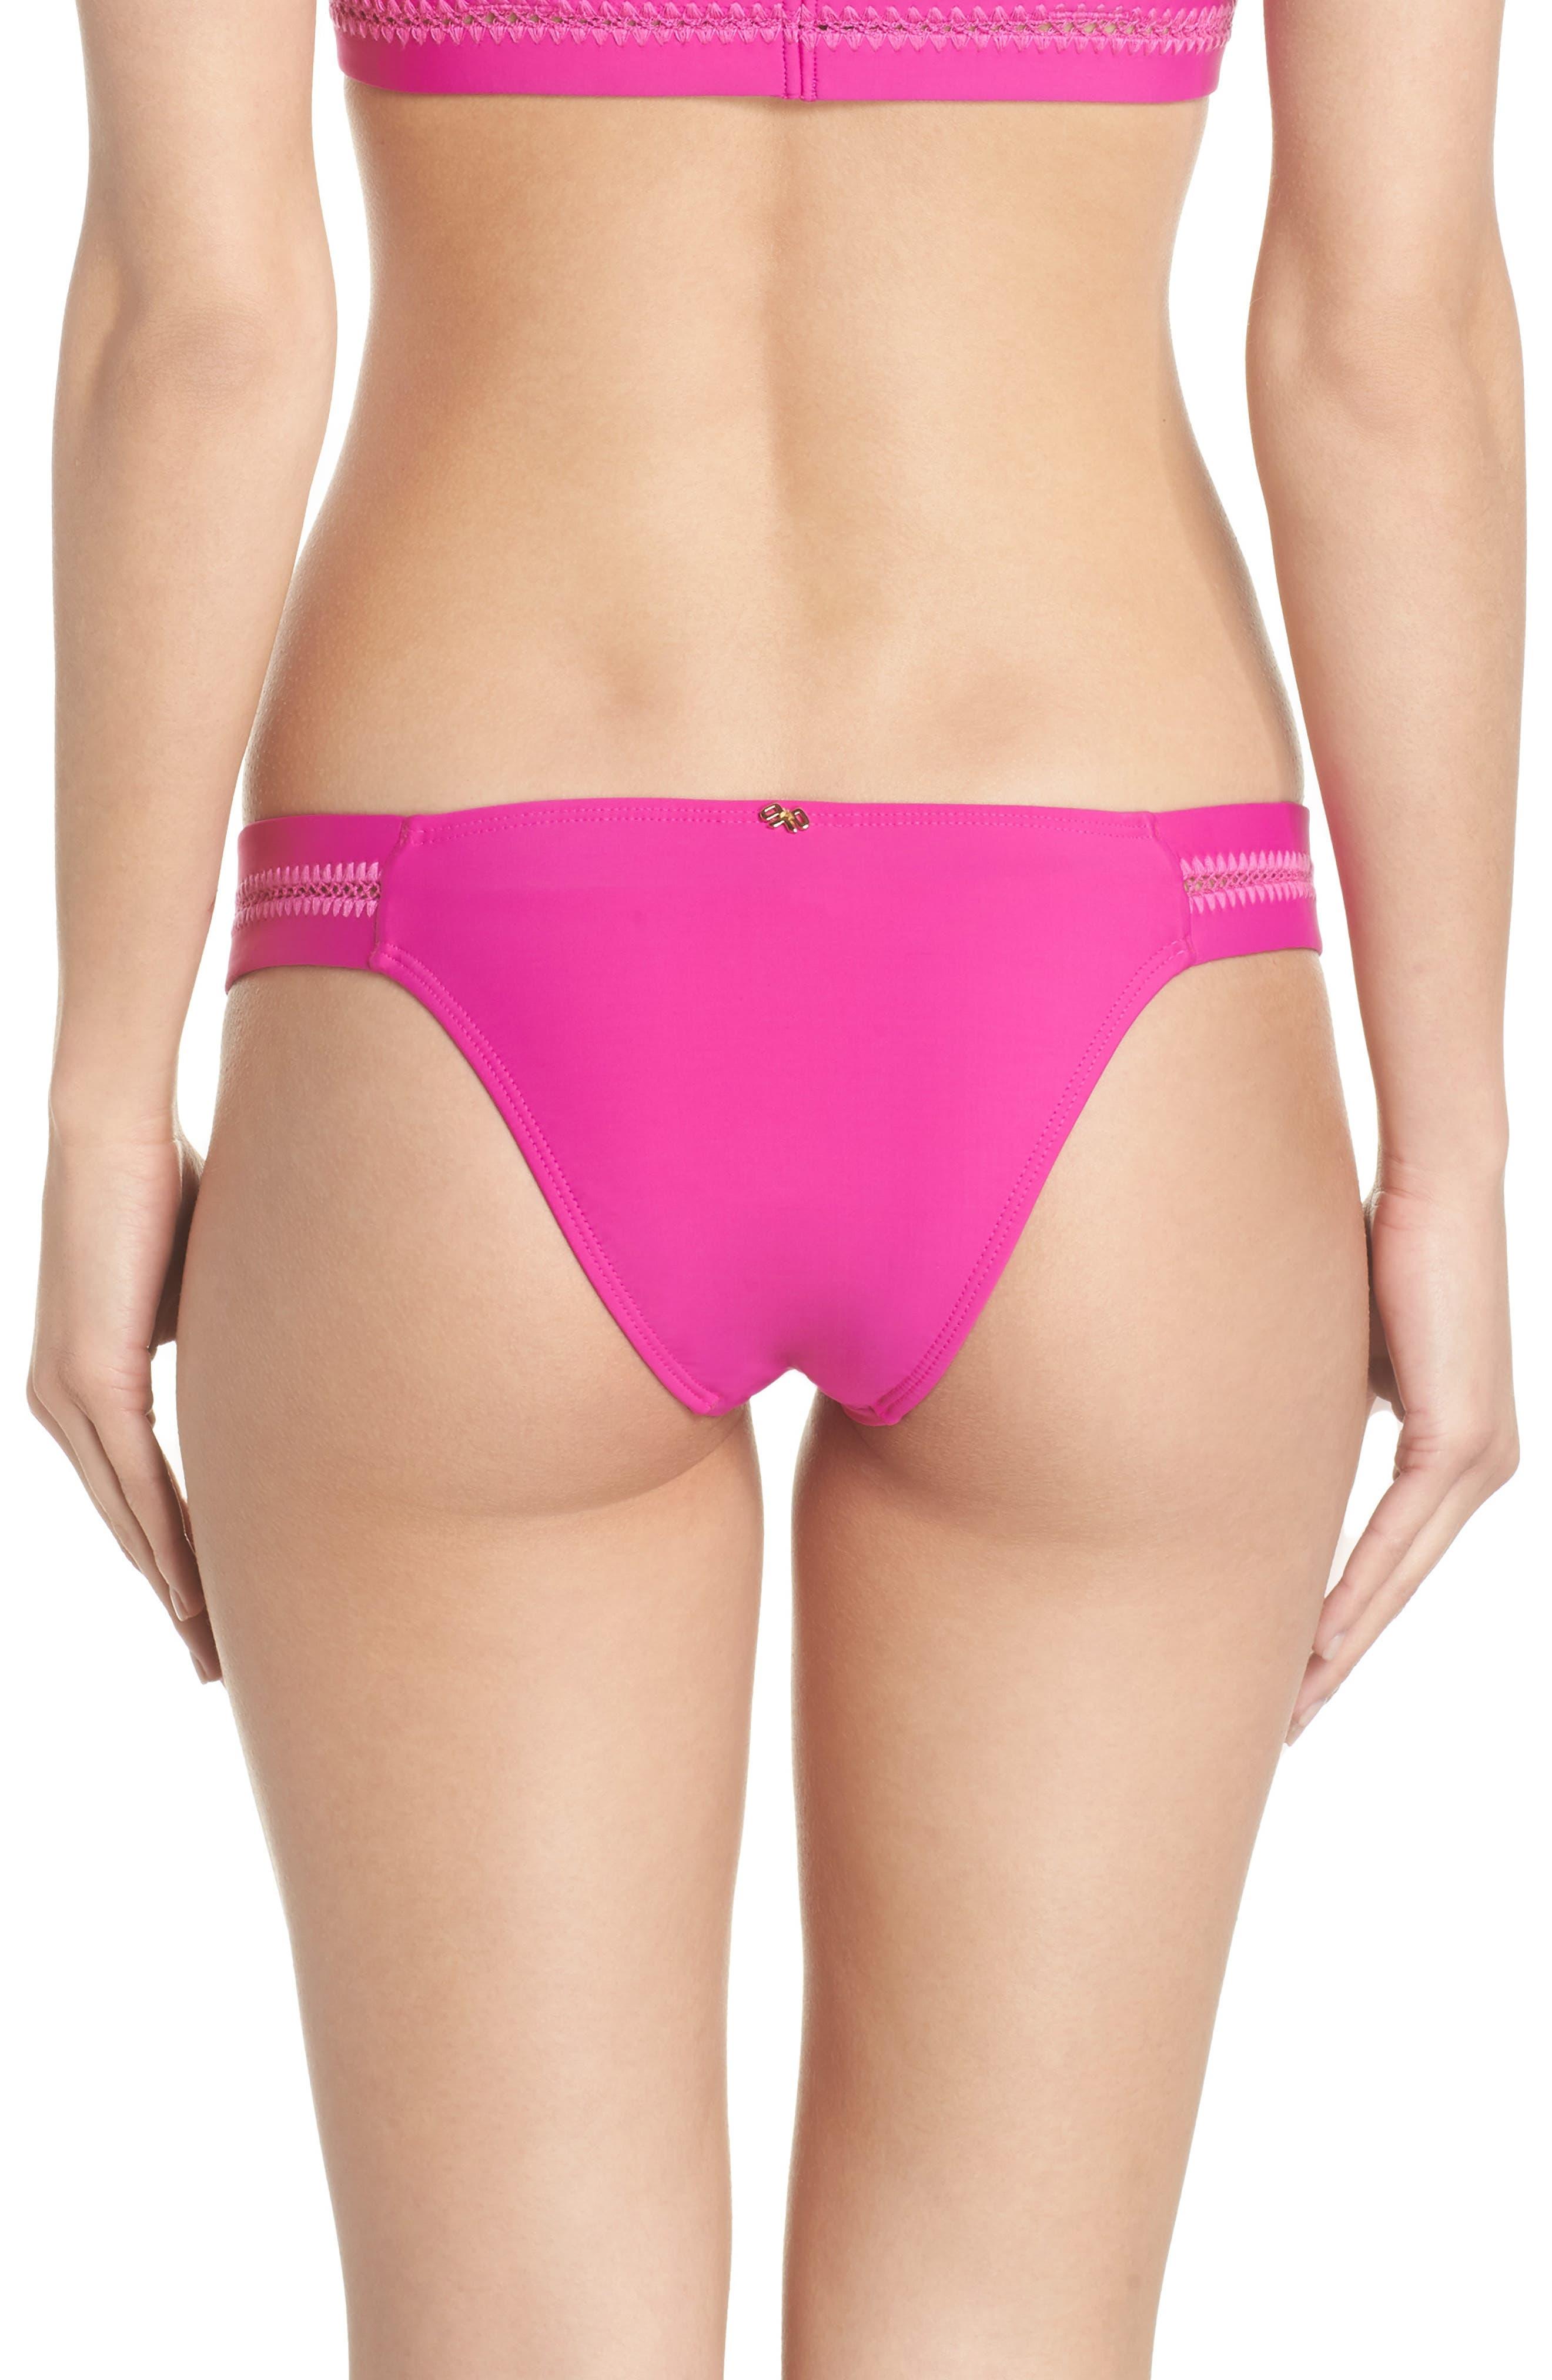 Teeny Stitched Bikini Bottoms,                             Alternate thumbnail 2, color,                             652